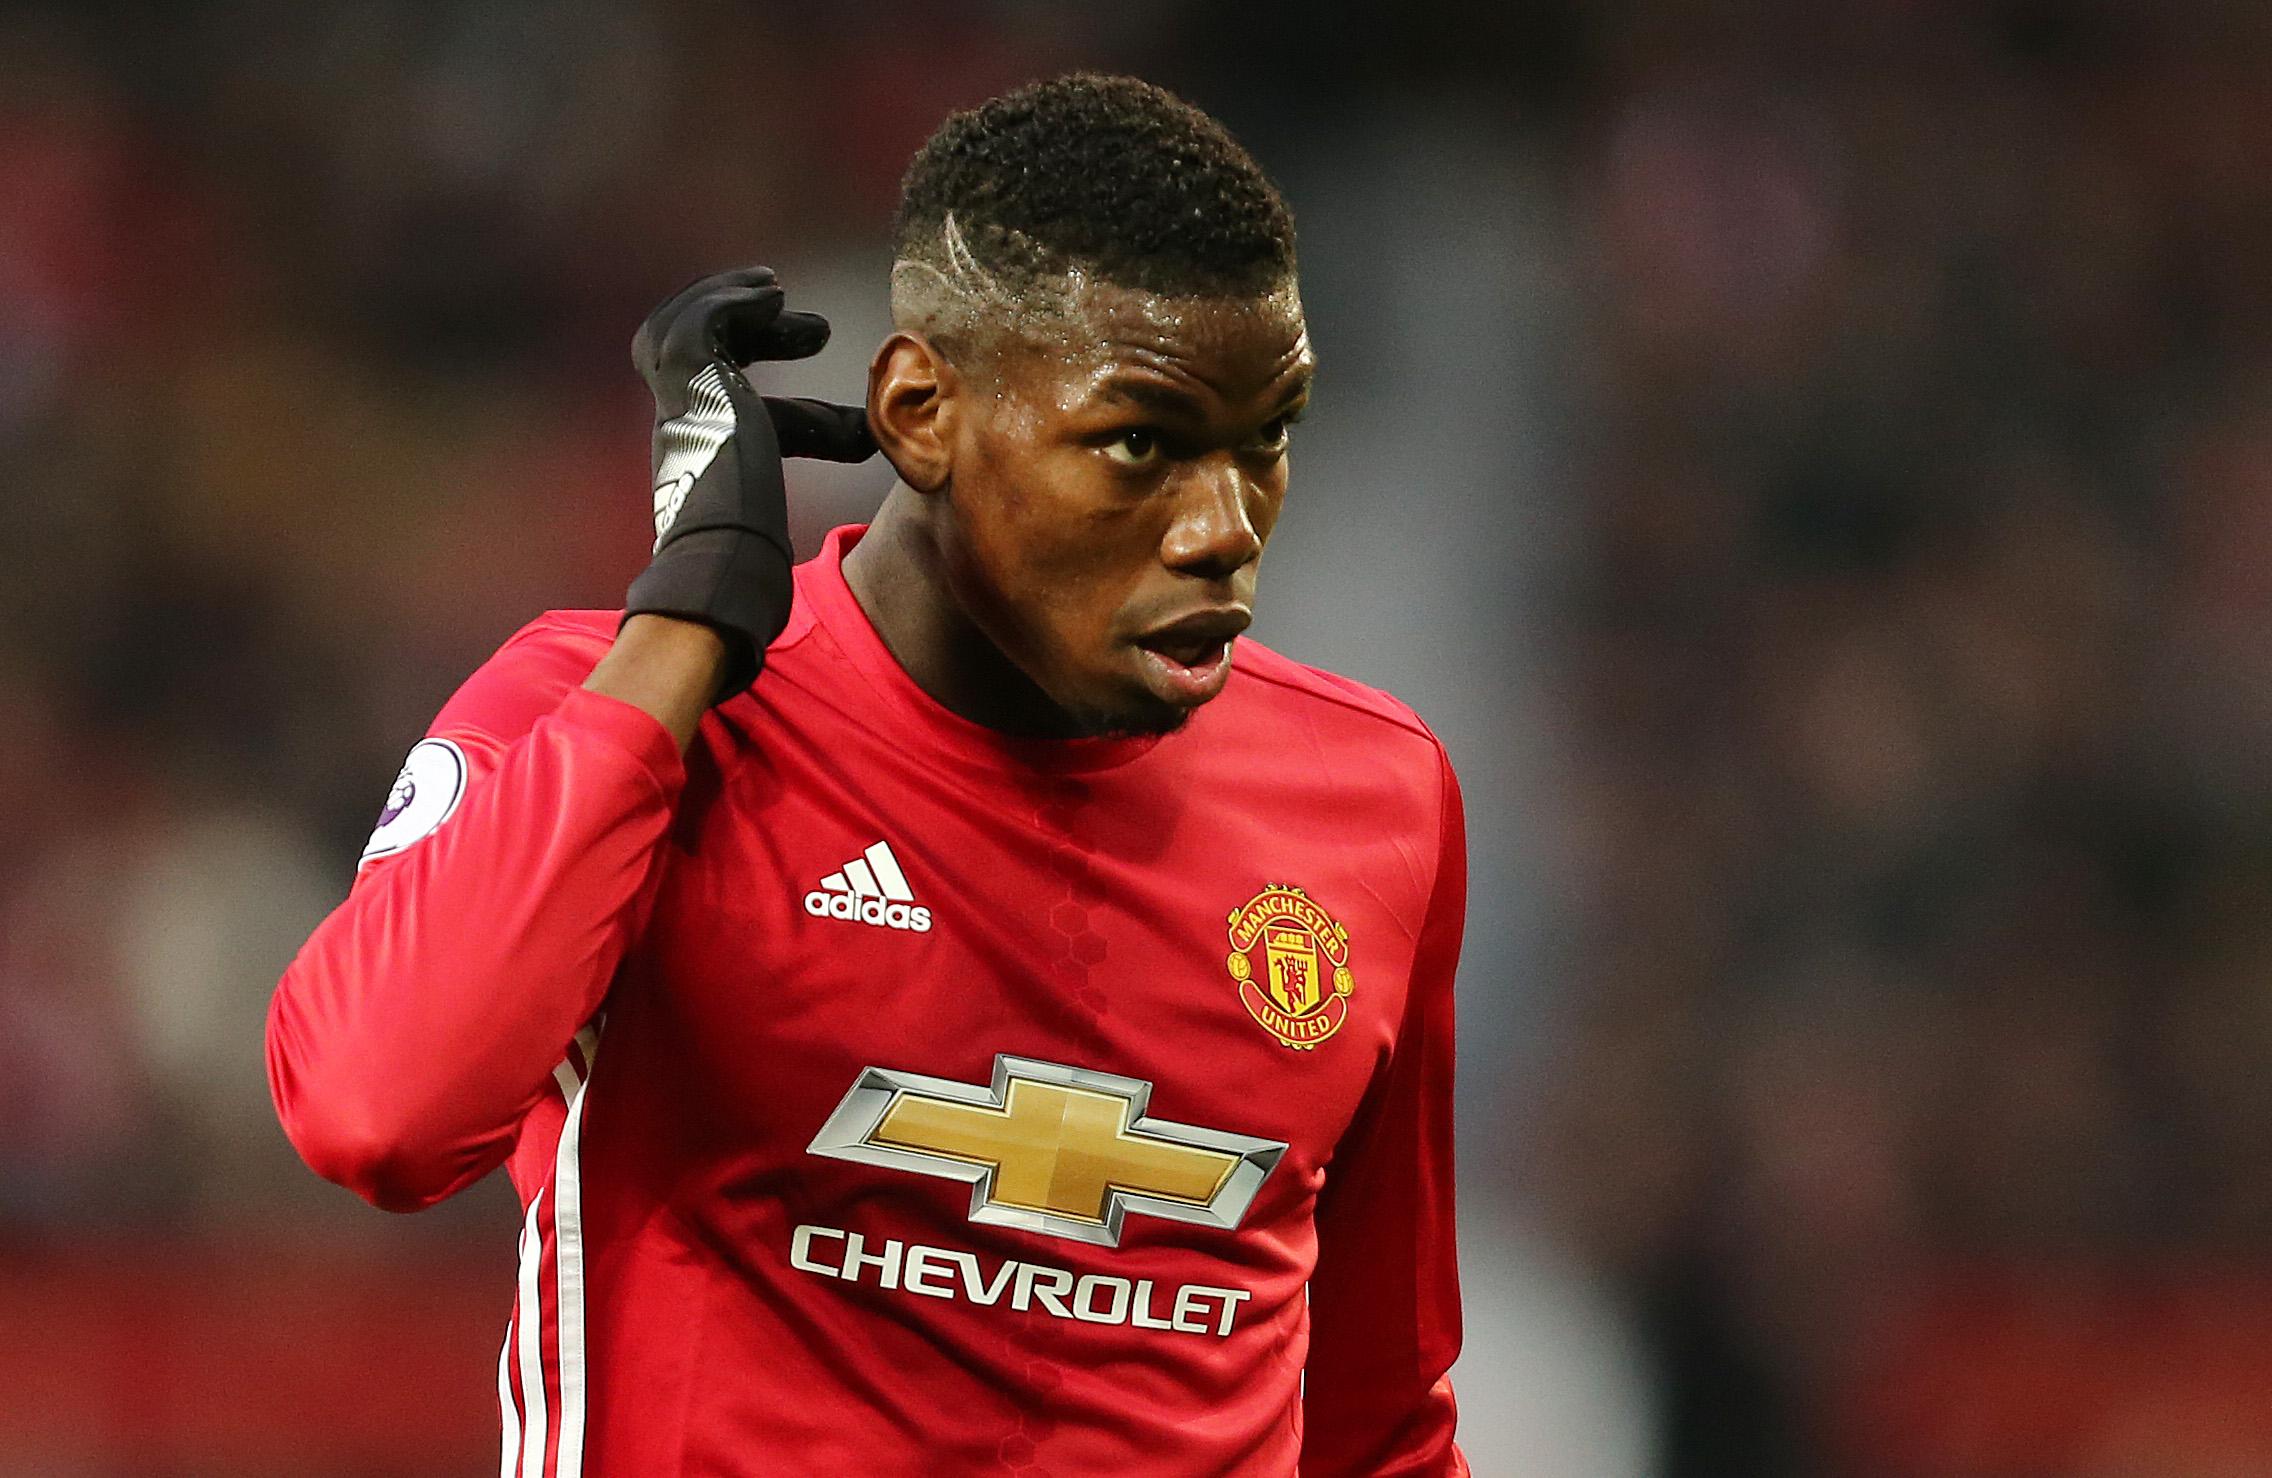 Paul Pogba wants me to return to Old Trafford, says Manchester United outcast Adnan Januzaj